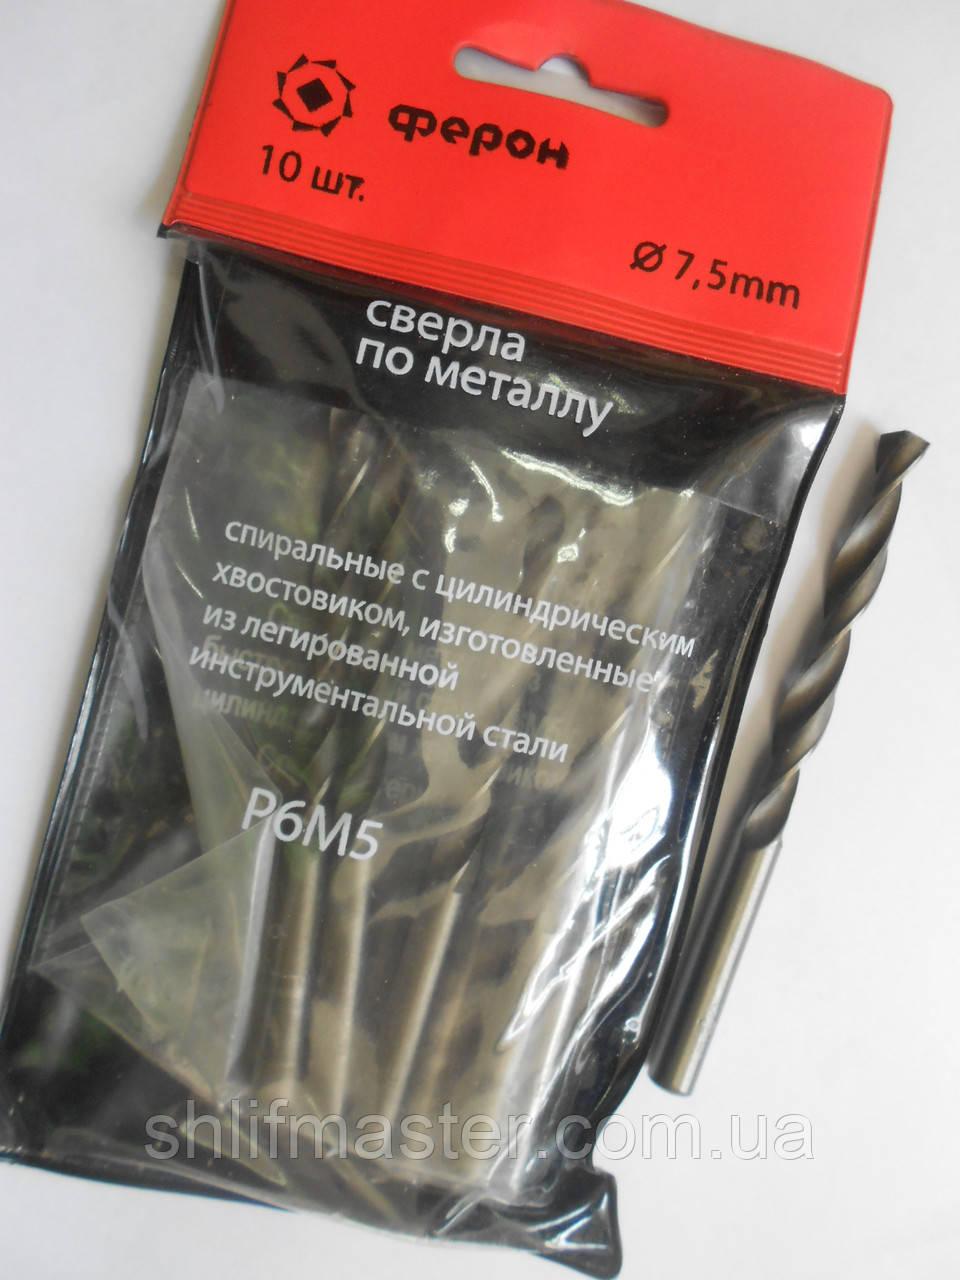 Сверло для работ по металлу D 7,5 мм